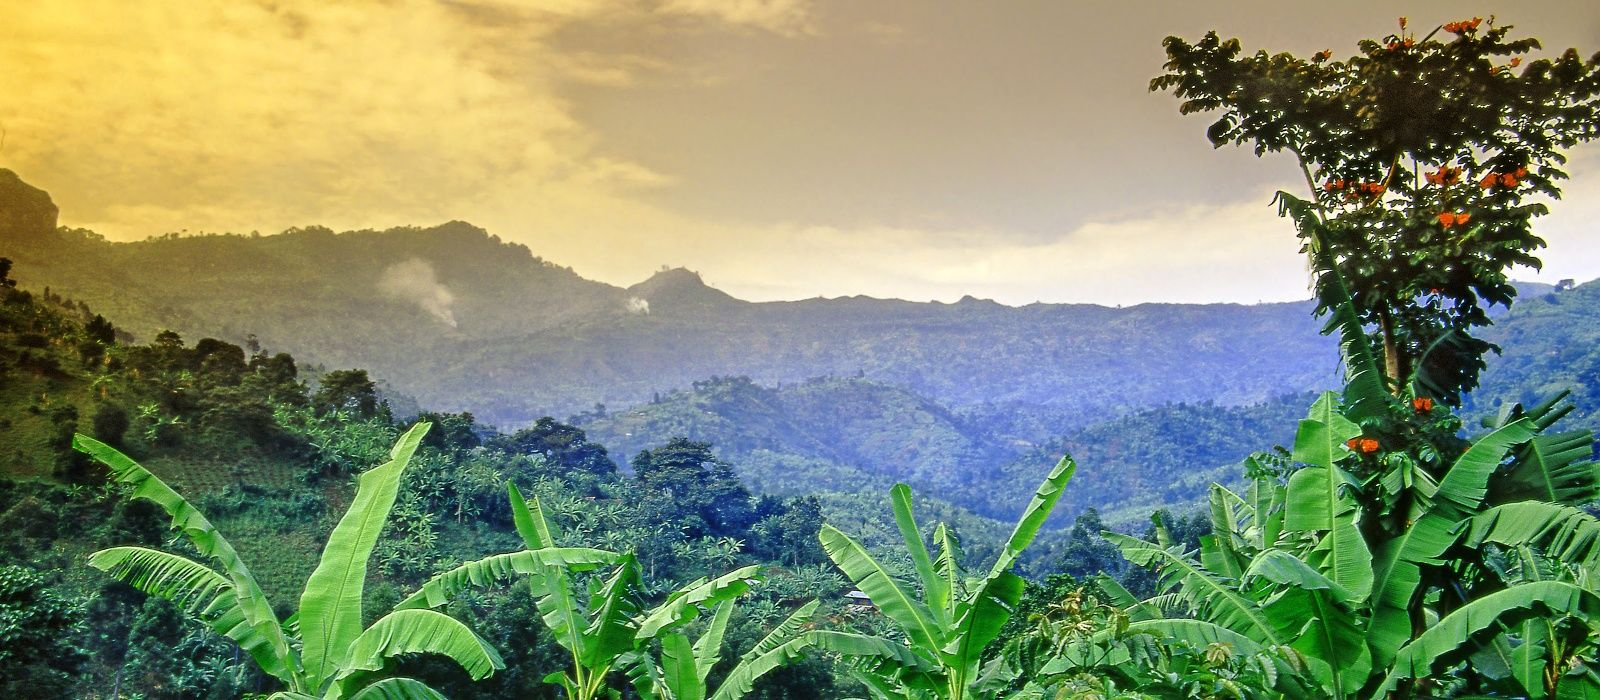 Destination Mt Elgon -Trekking Uganda